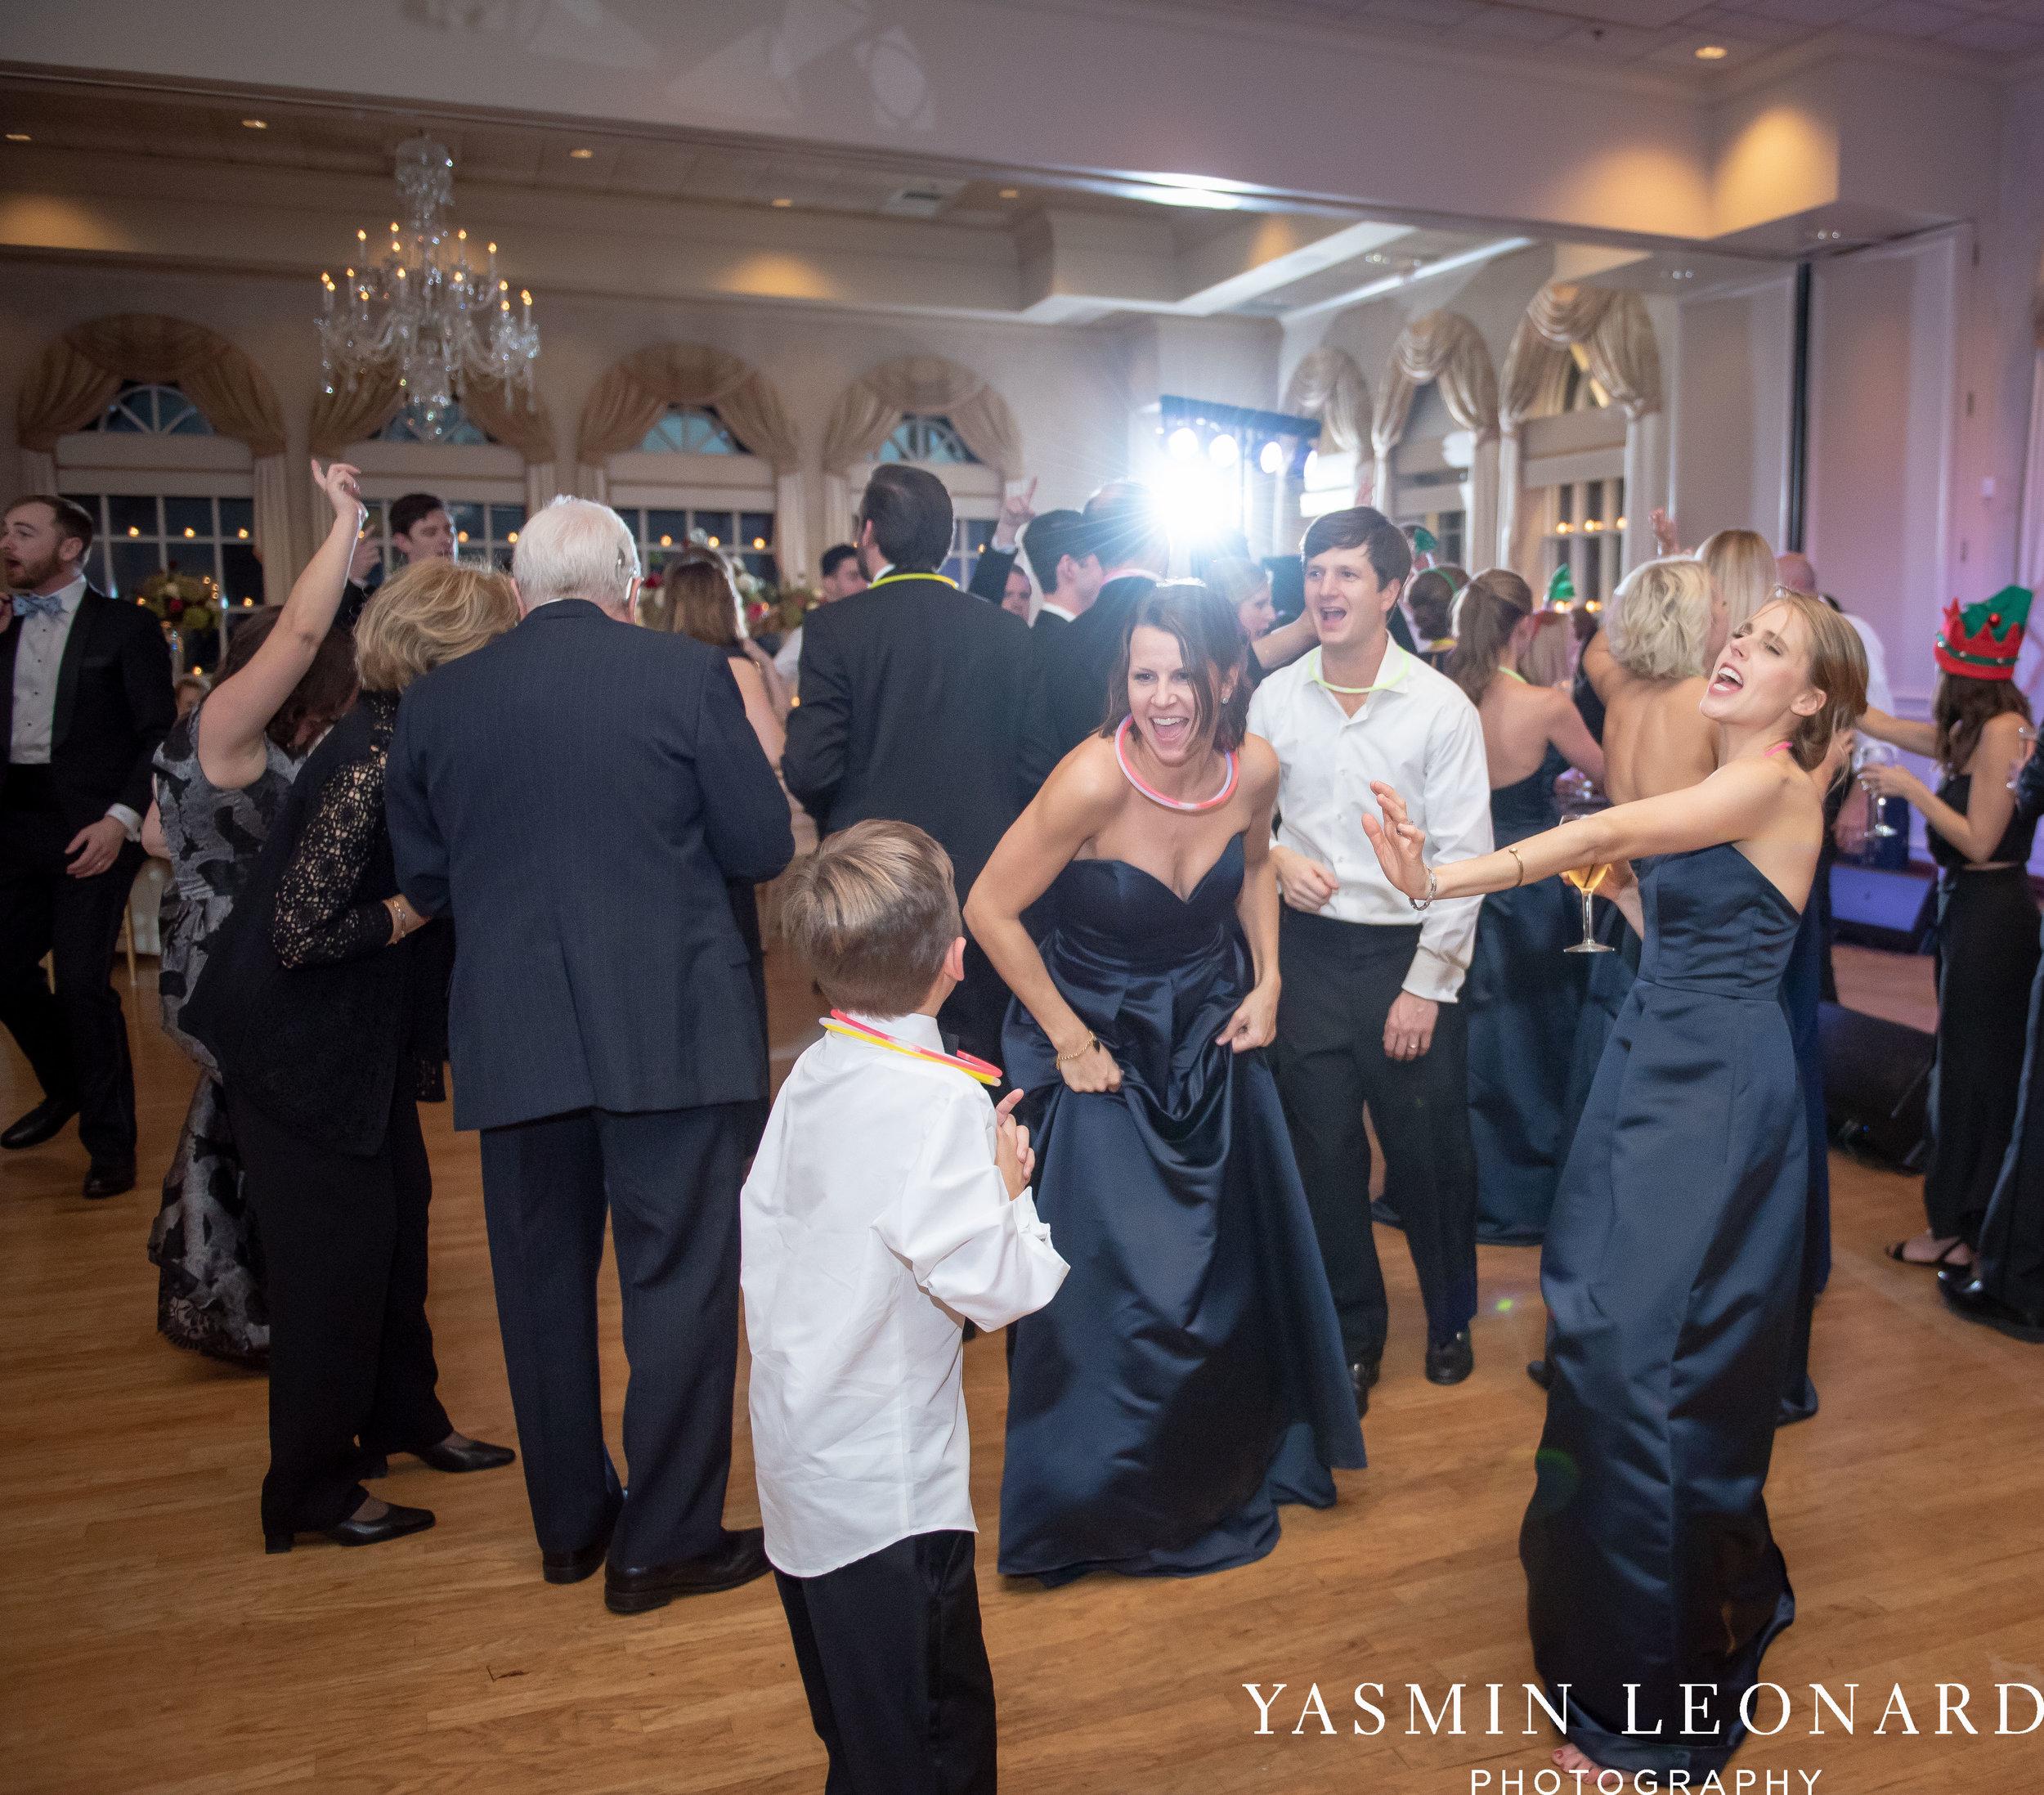 Wesley Memorial UMC - High Point Country Club - Emerywood Country Club - High Point Weddings - High Point Wedding Photographer - Yasmin Leonard Photography-48.jpg